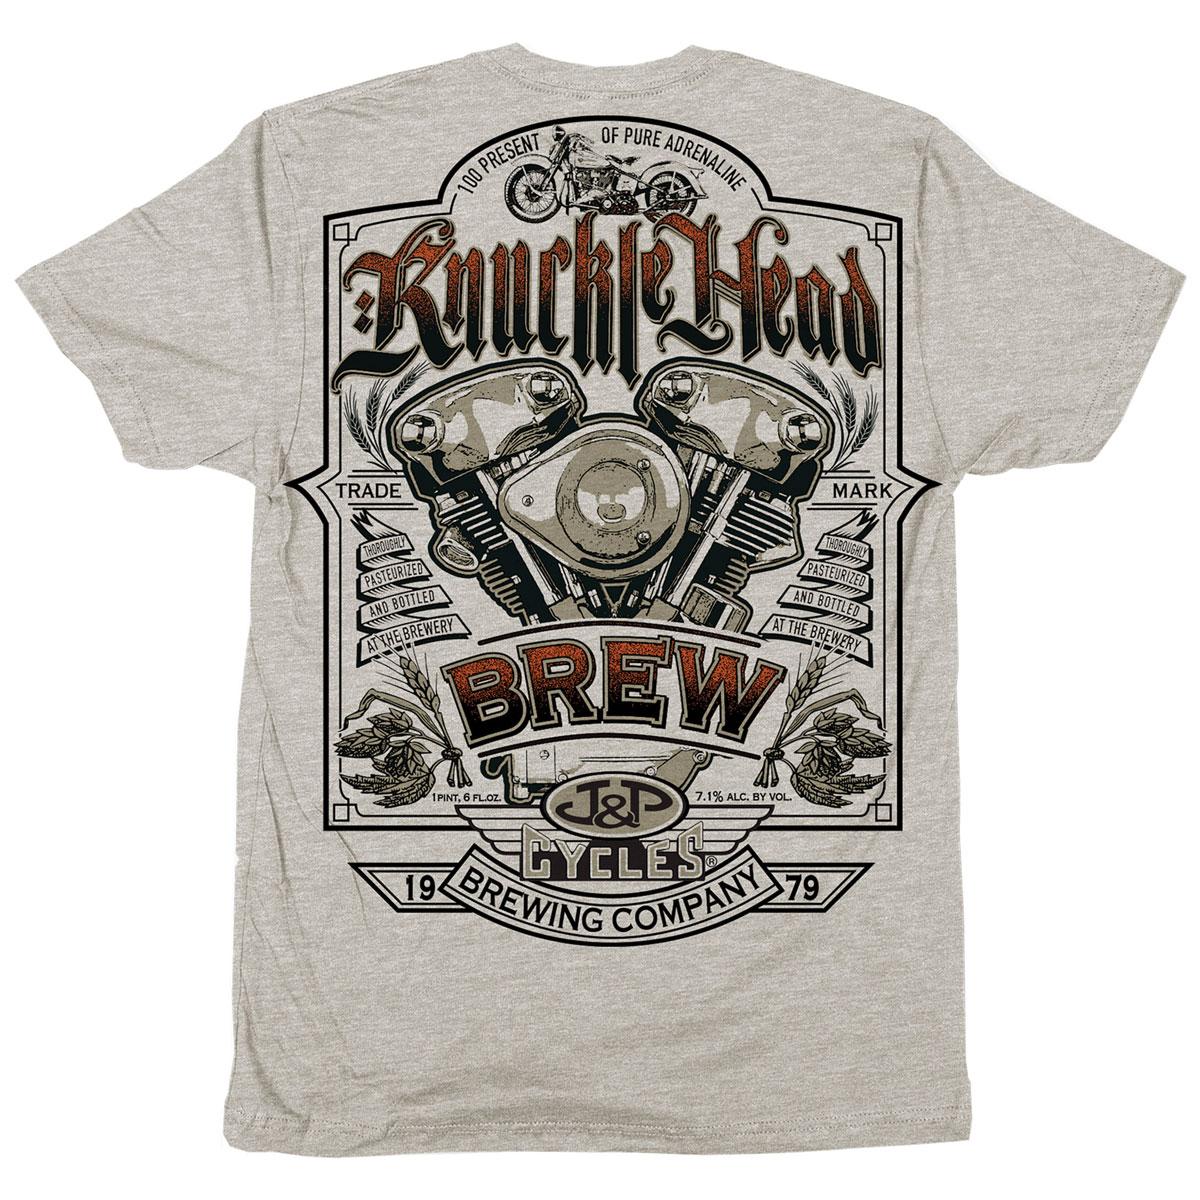 J&P Cycles Men's Knuckle Head Oatmeal Heather T-Shirt